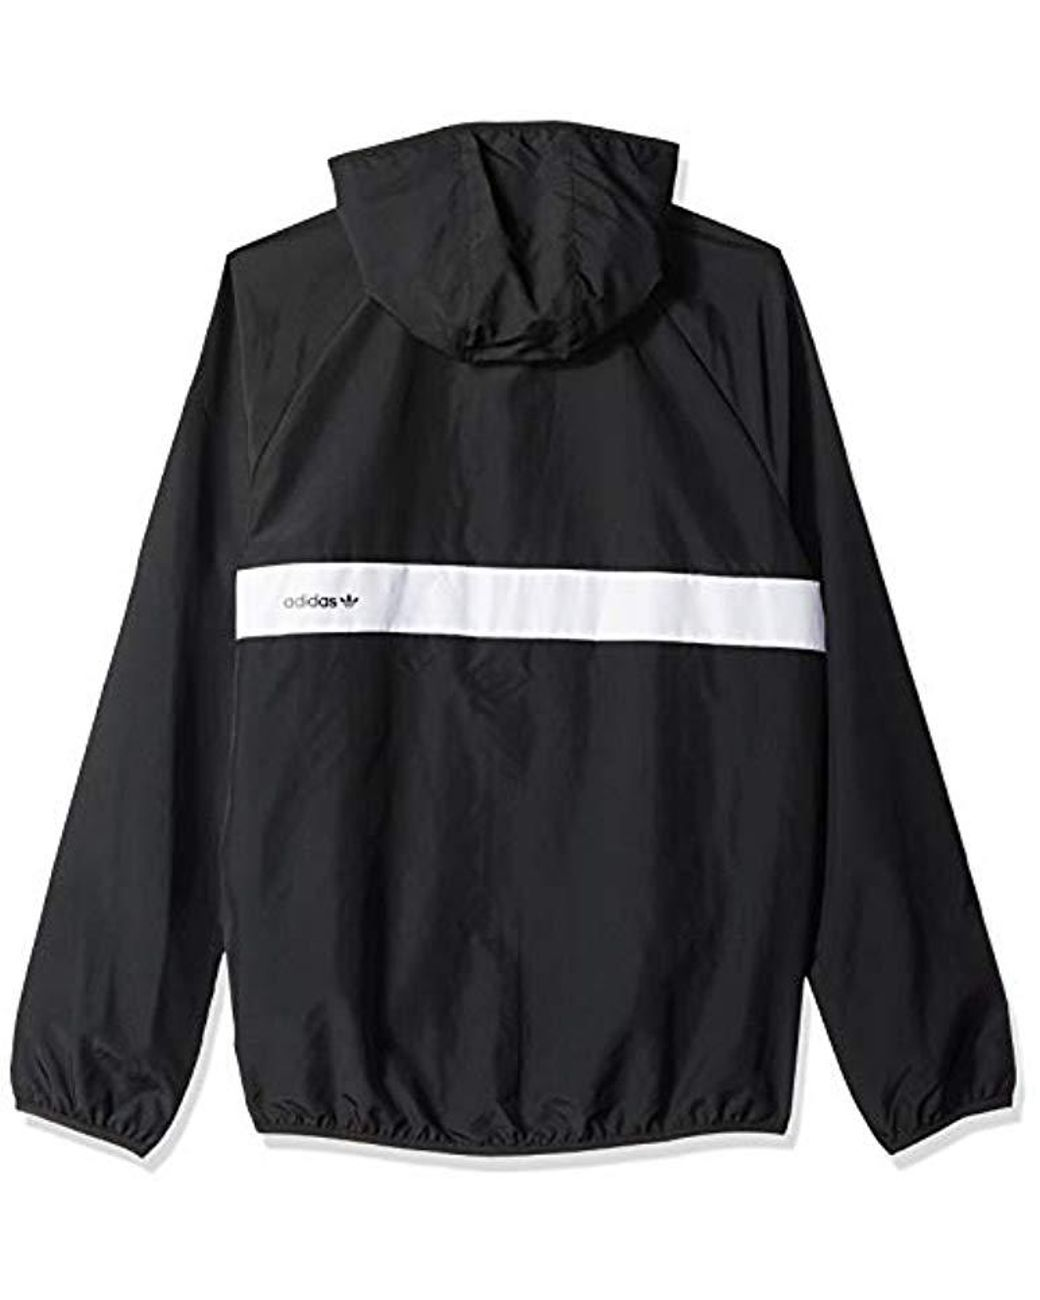 ce6d74b1e Men's Black Skateboarding Packable Wind Jacket